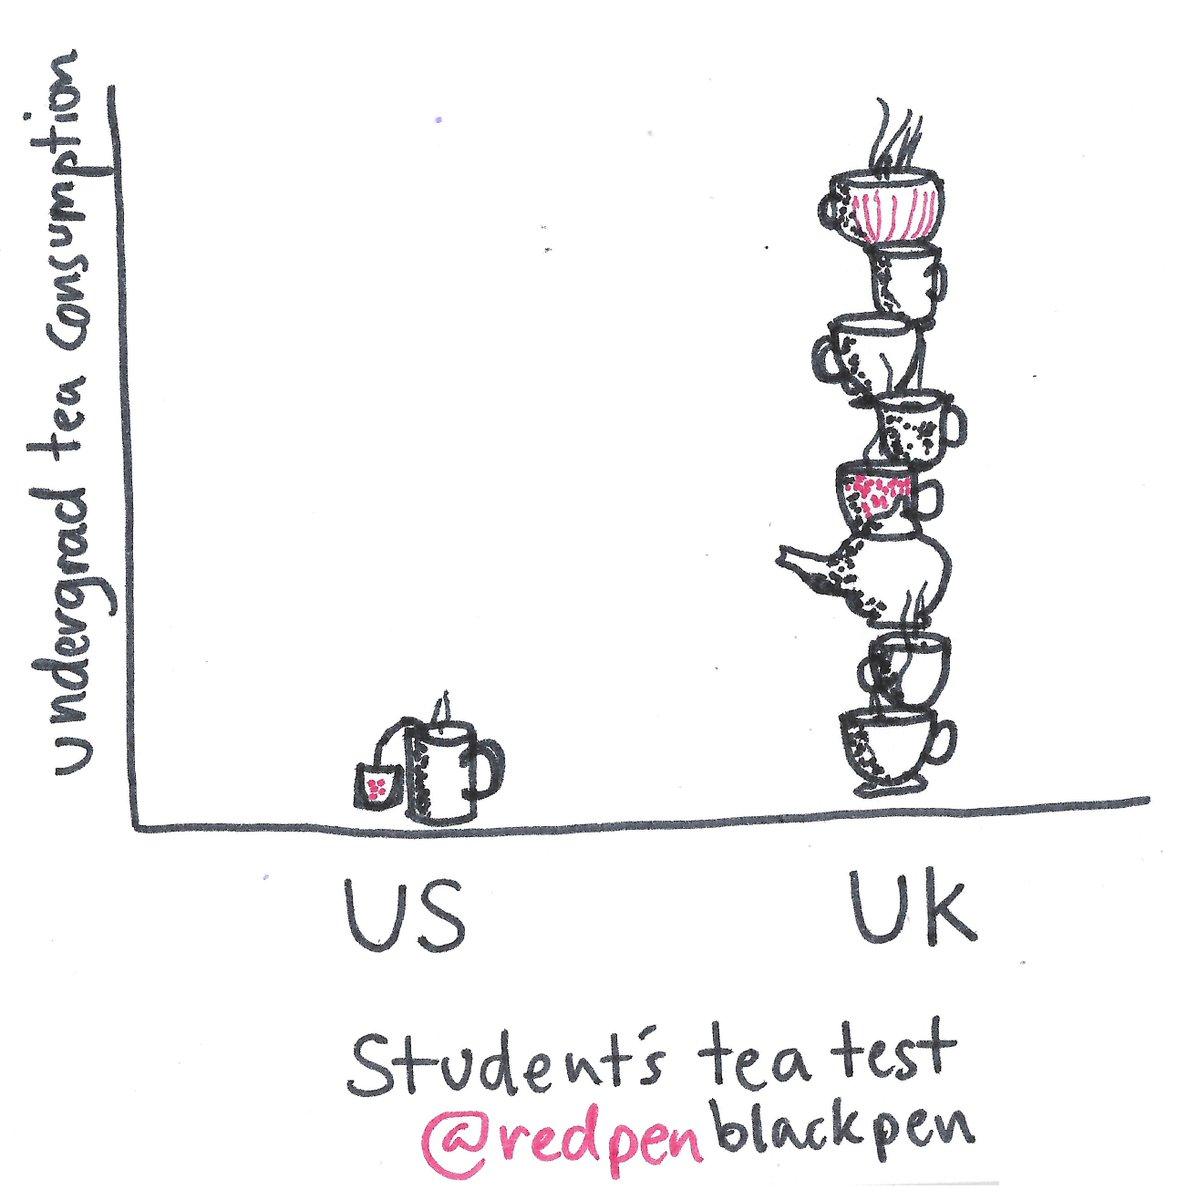 Student&#39;s tea test #inktober2017 #statistics <br>http://pic.twitter.com/hfFv8HILhz